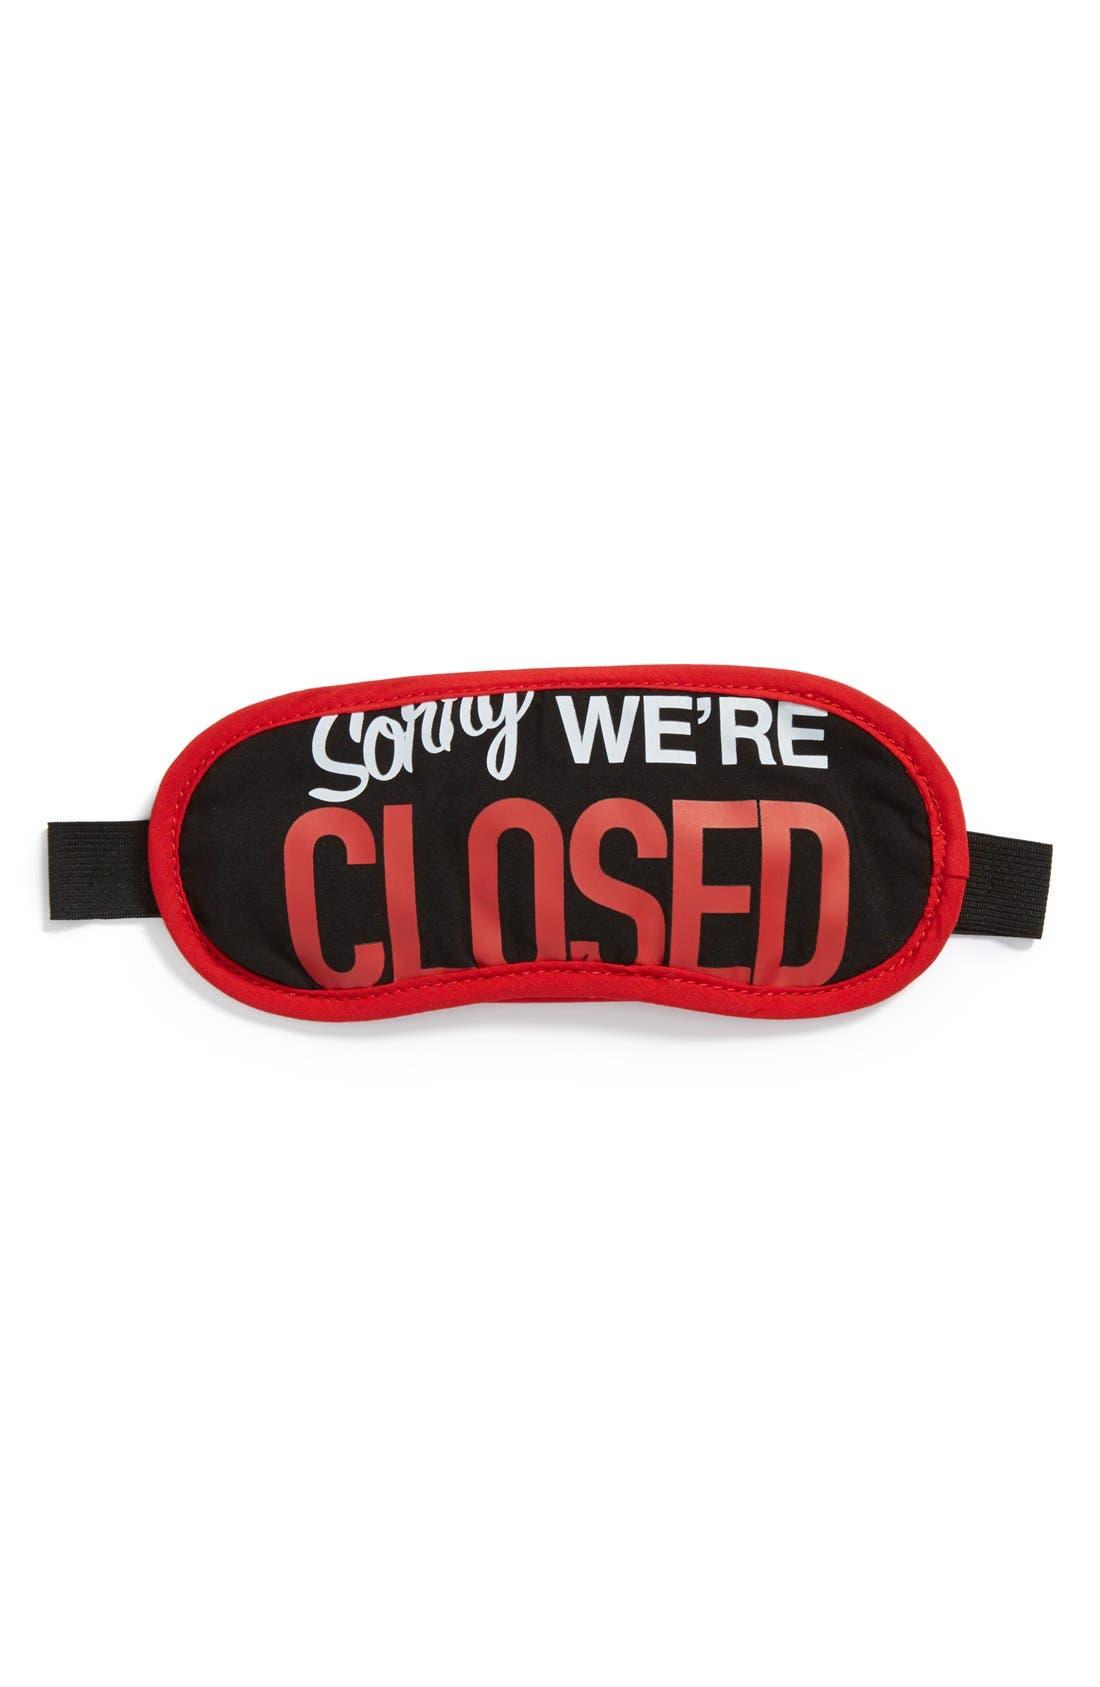 Alternate Image 1 Selected - Flight 001 'Sorry, We're Closed' Sleep Mask